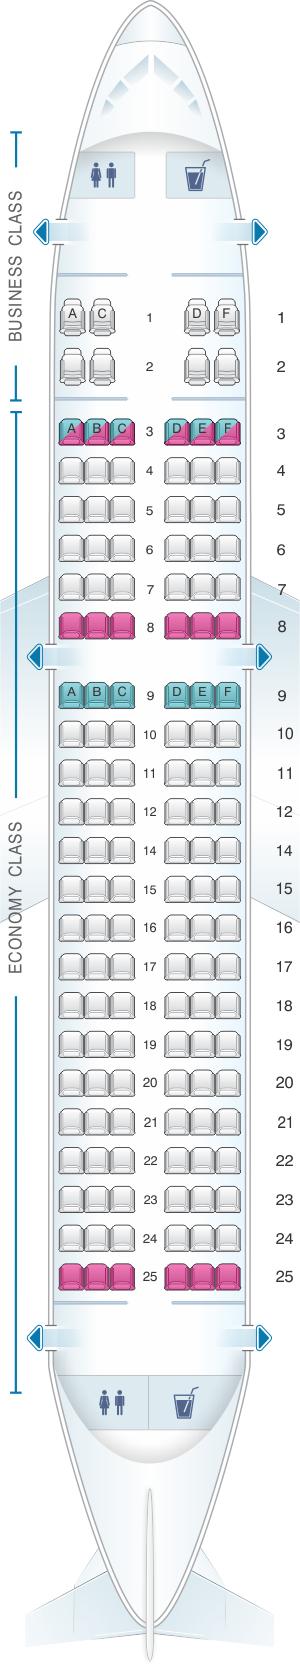 Seat map for Bulgaria Air Airbus A319